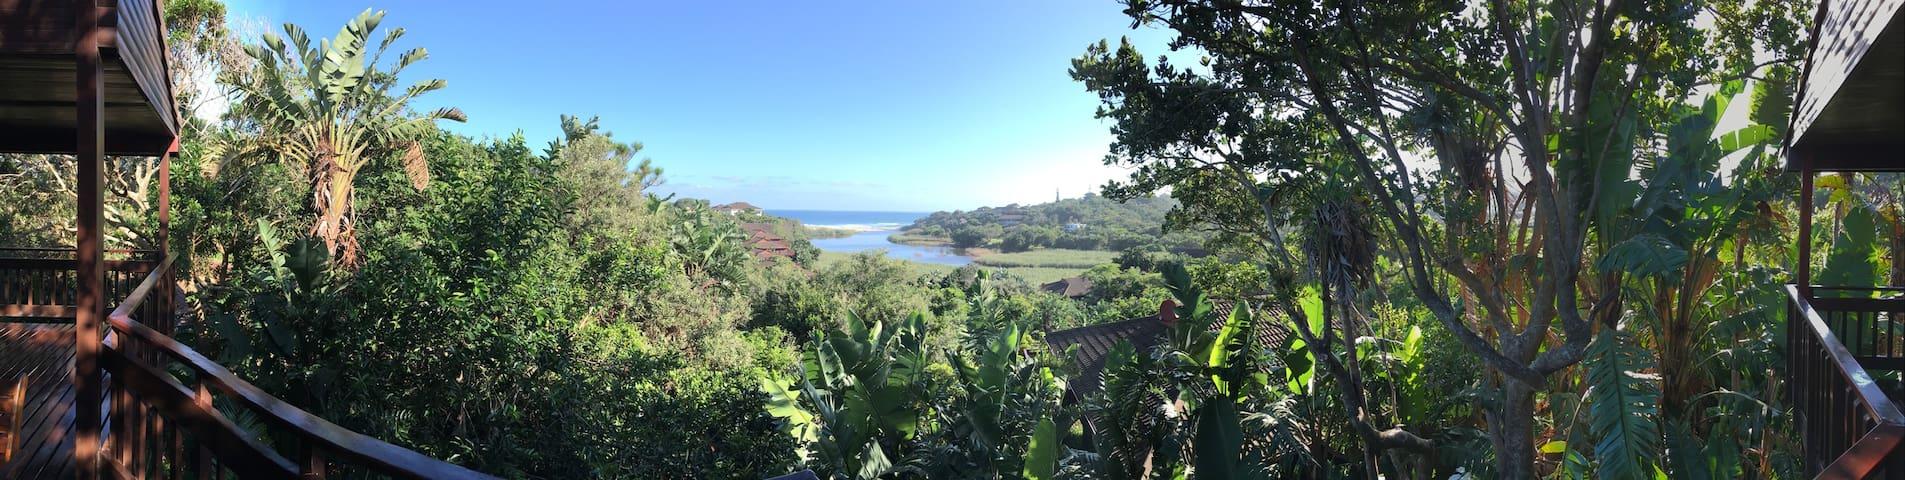 Umkobi Lodge - Southbroom - Casa vacanze